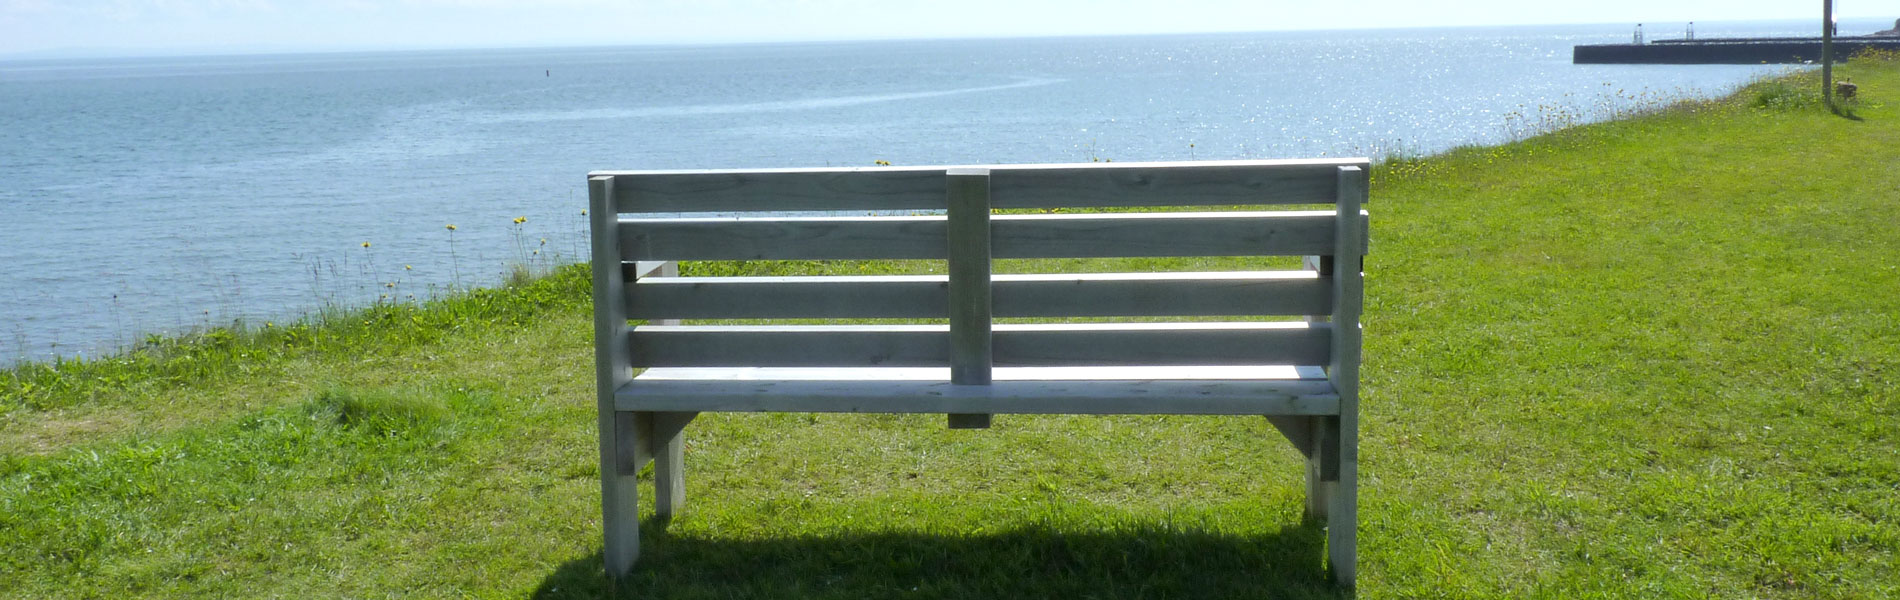 Community Museums Association of Prince Edward Island